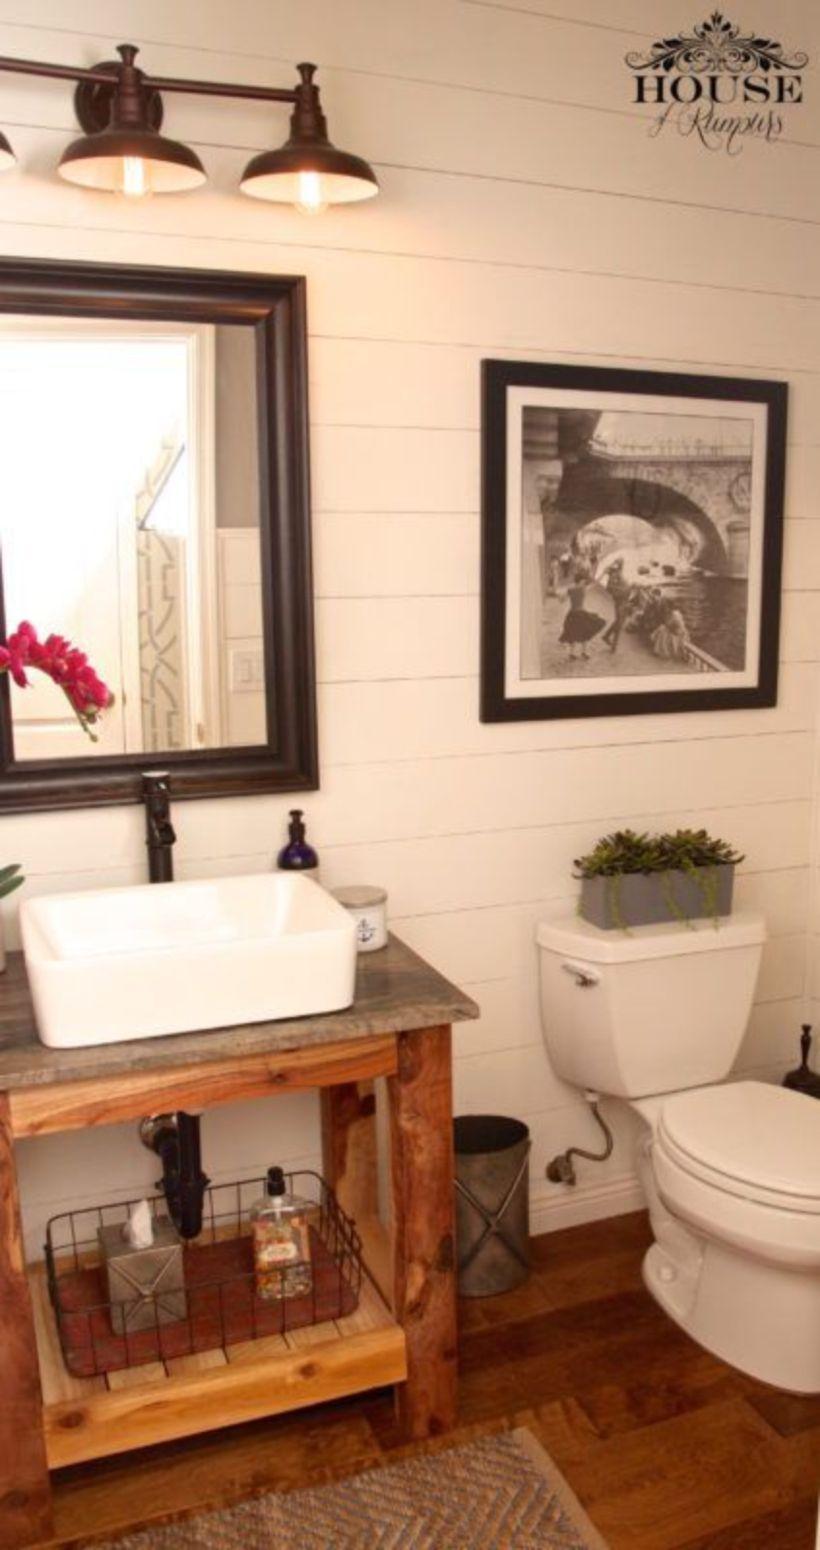 55 Farmhouse Bathroom Ideas for Small Space Rustic